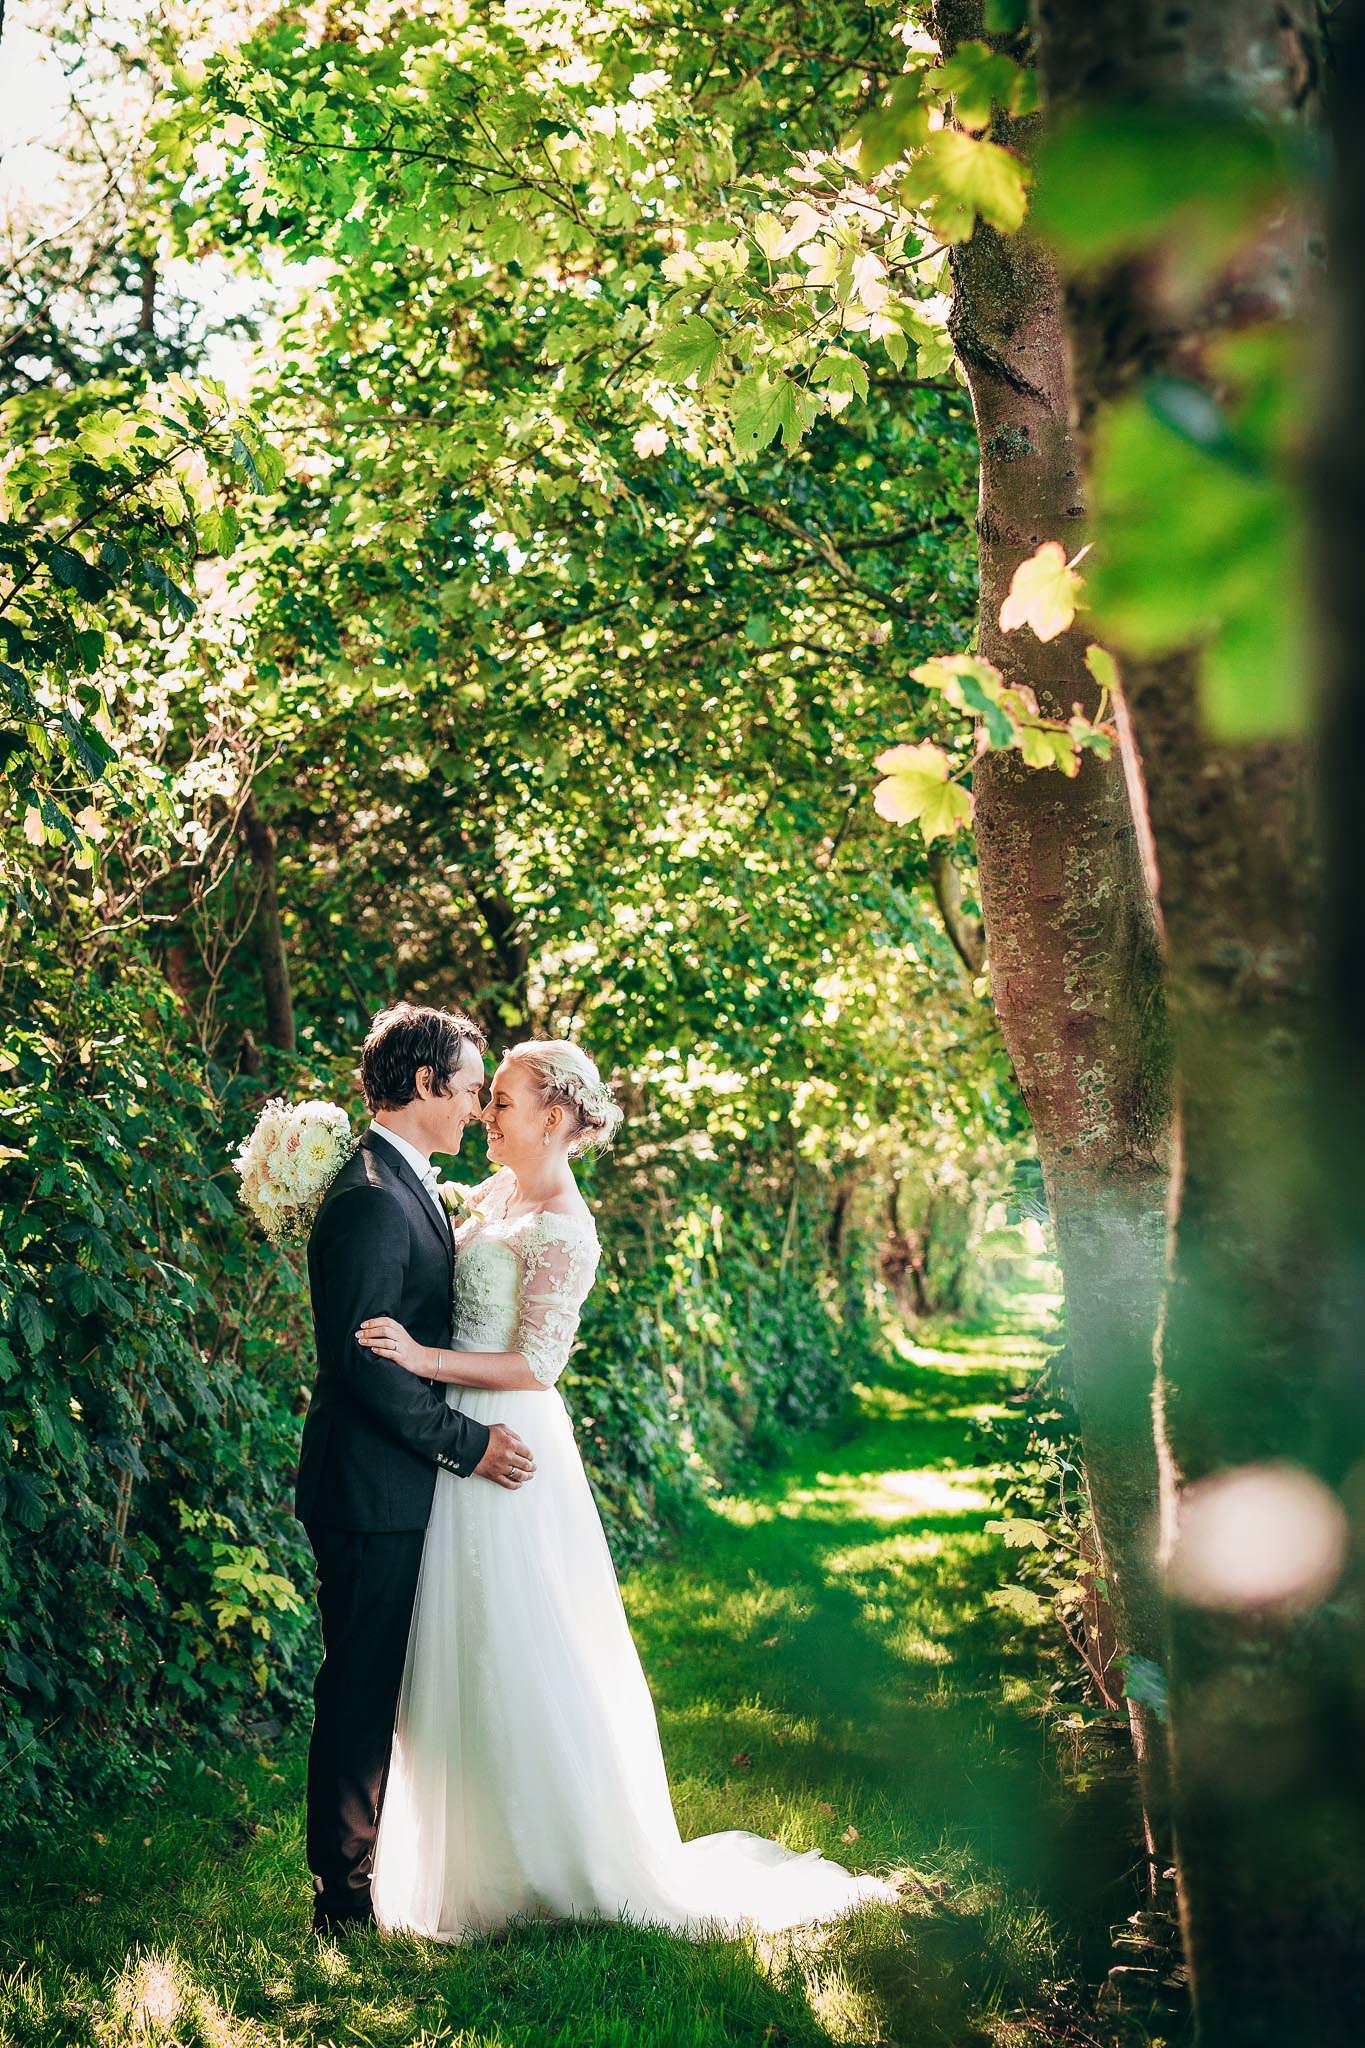 Wedding+Photographer+Norway+Bryllupsfotograf+Casey+Arneson+JT-105.jpg